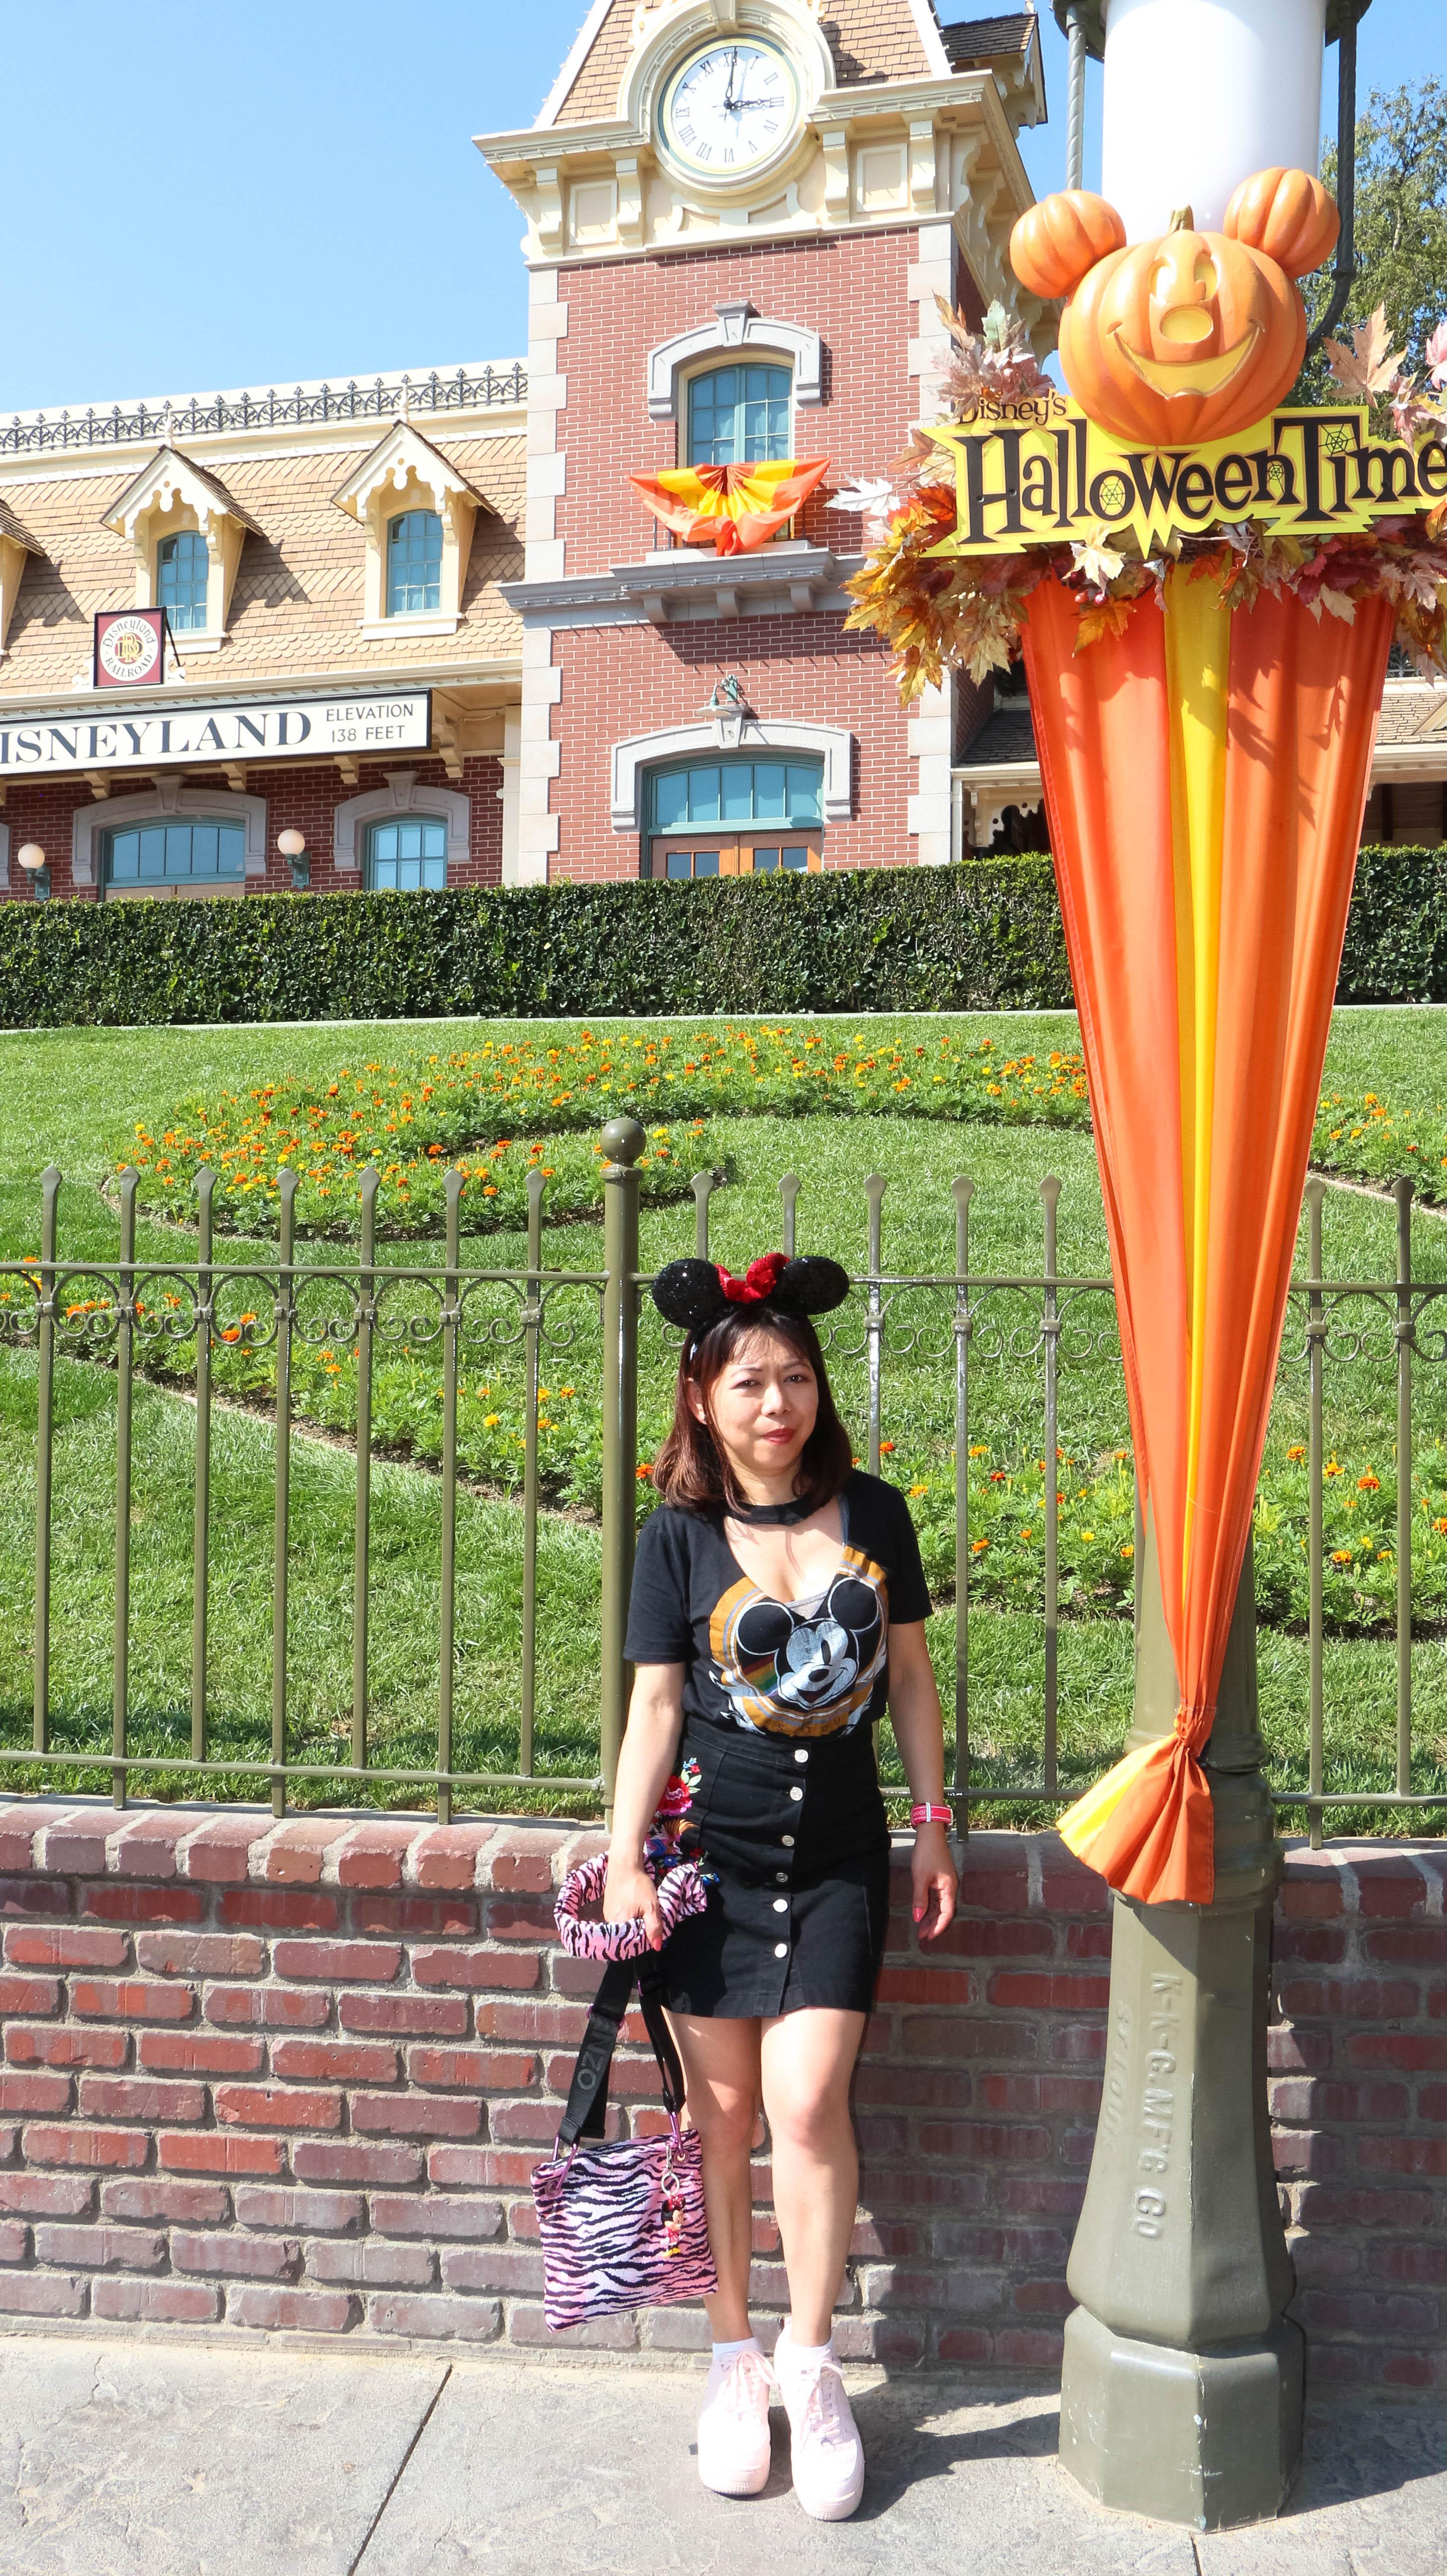 Disneyland Mickey Mouse landscape